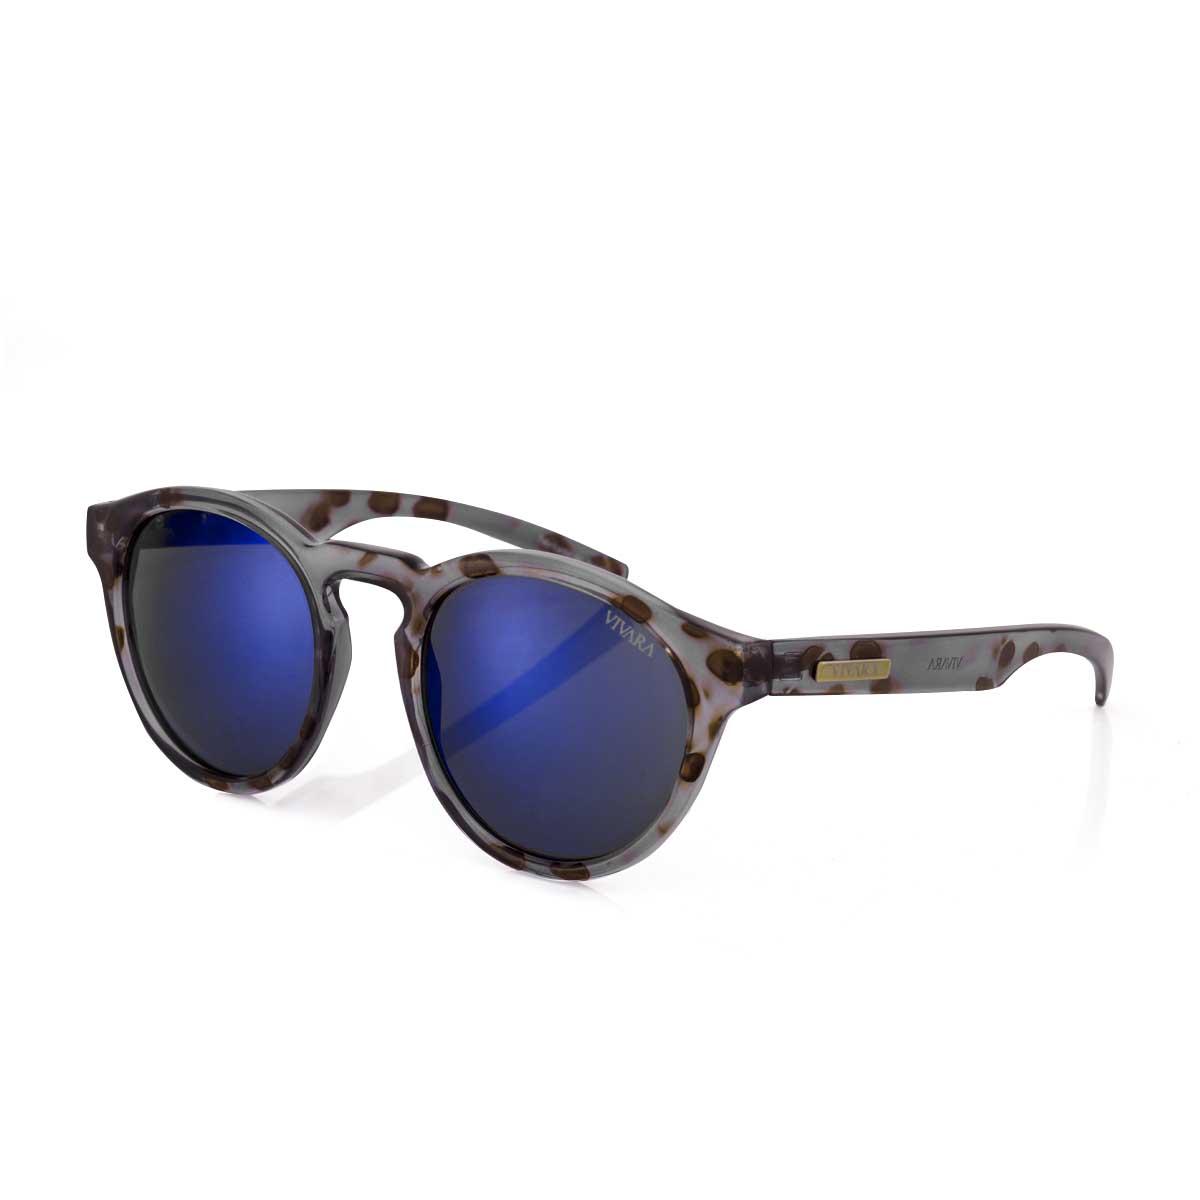 166da7836e699 Óculos de Sol Redondo em Acetato Tigre Cinza